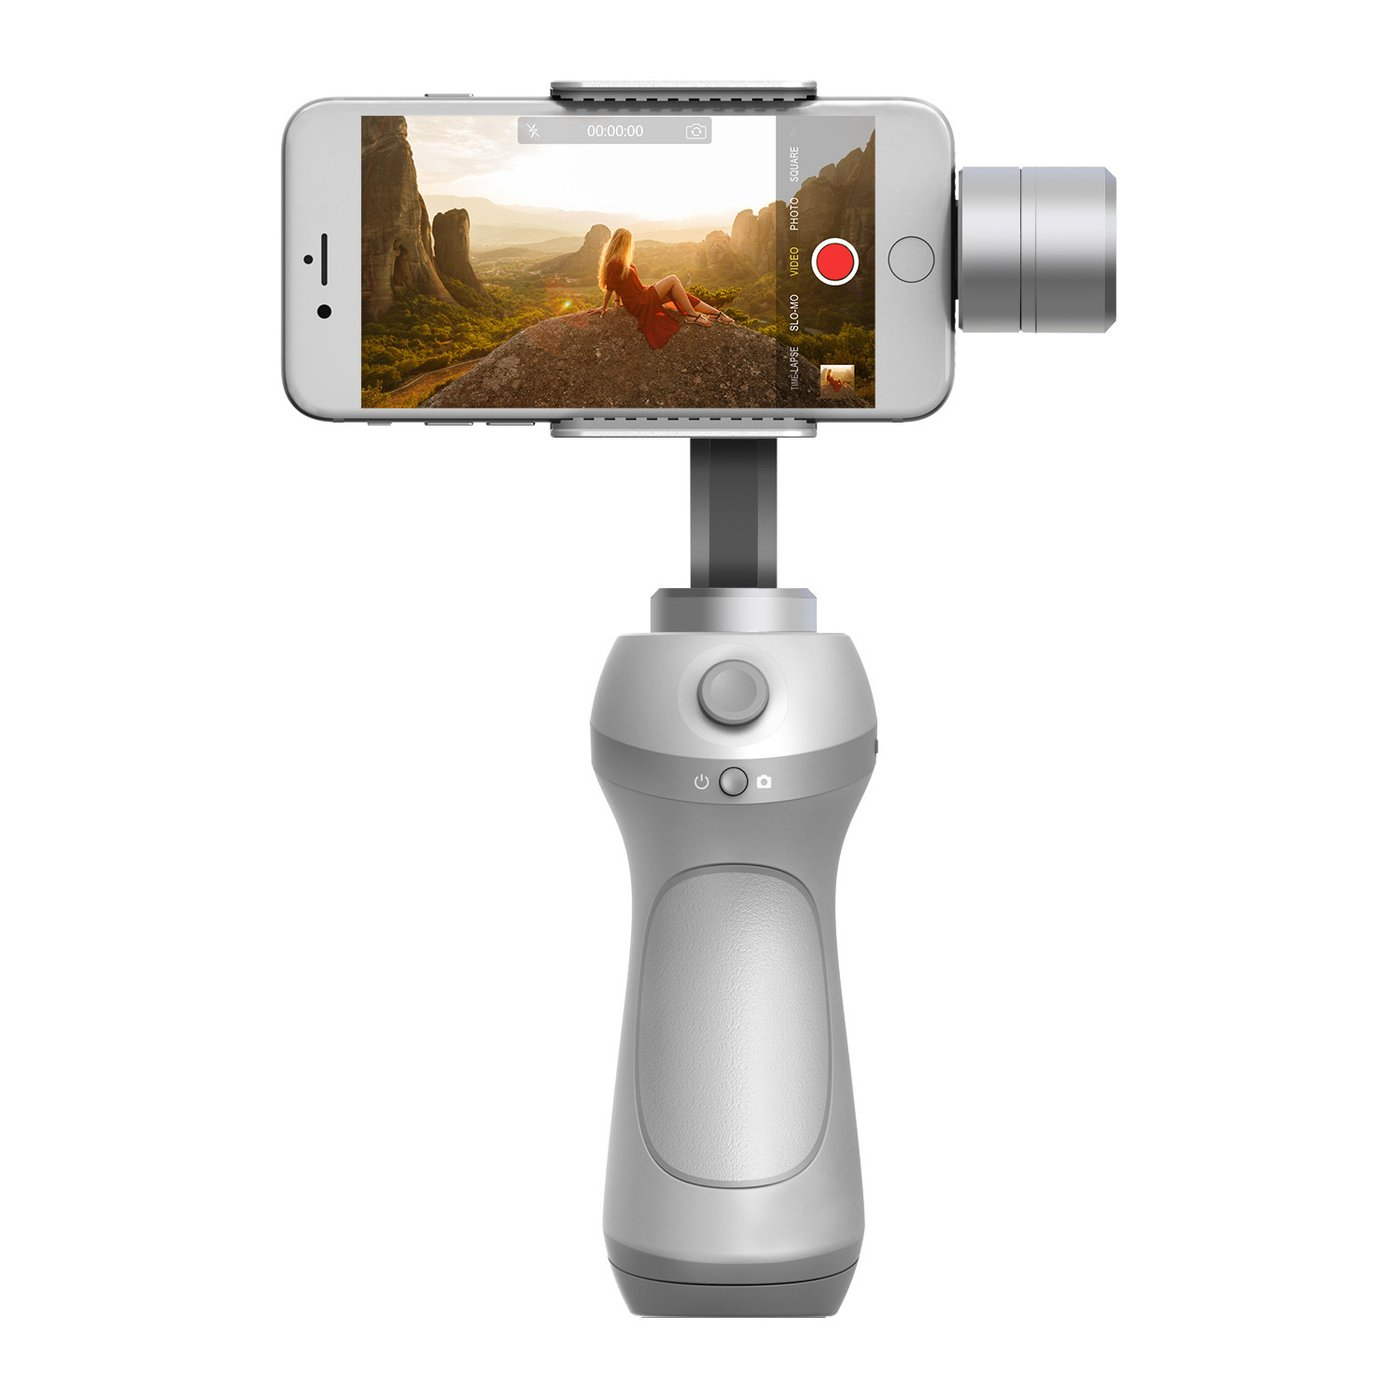 FeiyuTech Gimbal ไม้กันสั่นมือถือ Vimble c Smart Phone Gimbal App Control, Face-tracking, Panorama and Selfie Ready